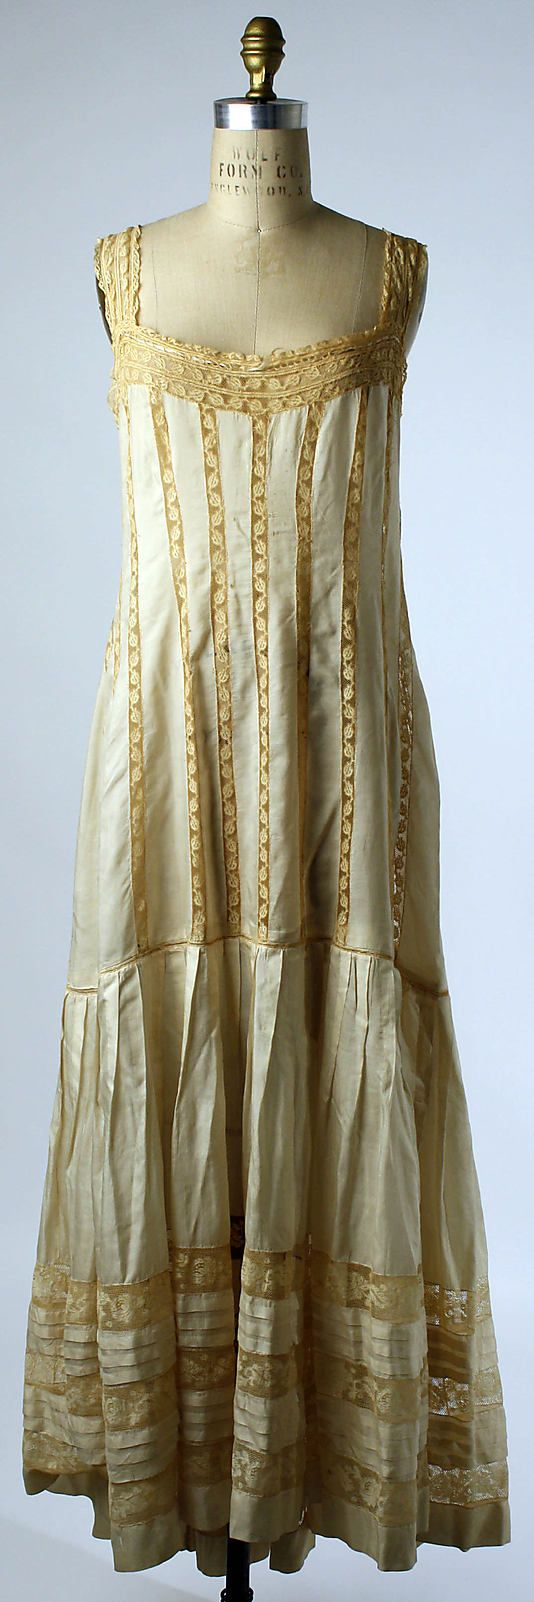 "Silk ""underskirt,"" dated 1910s, American or European. Metropolitan Museum of Art collection: C.I.40.106.31"